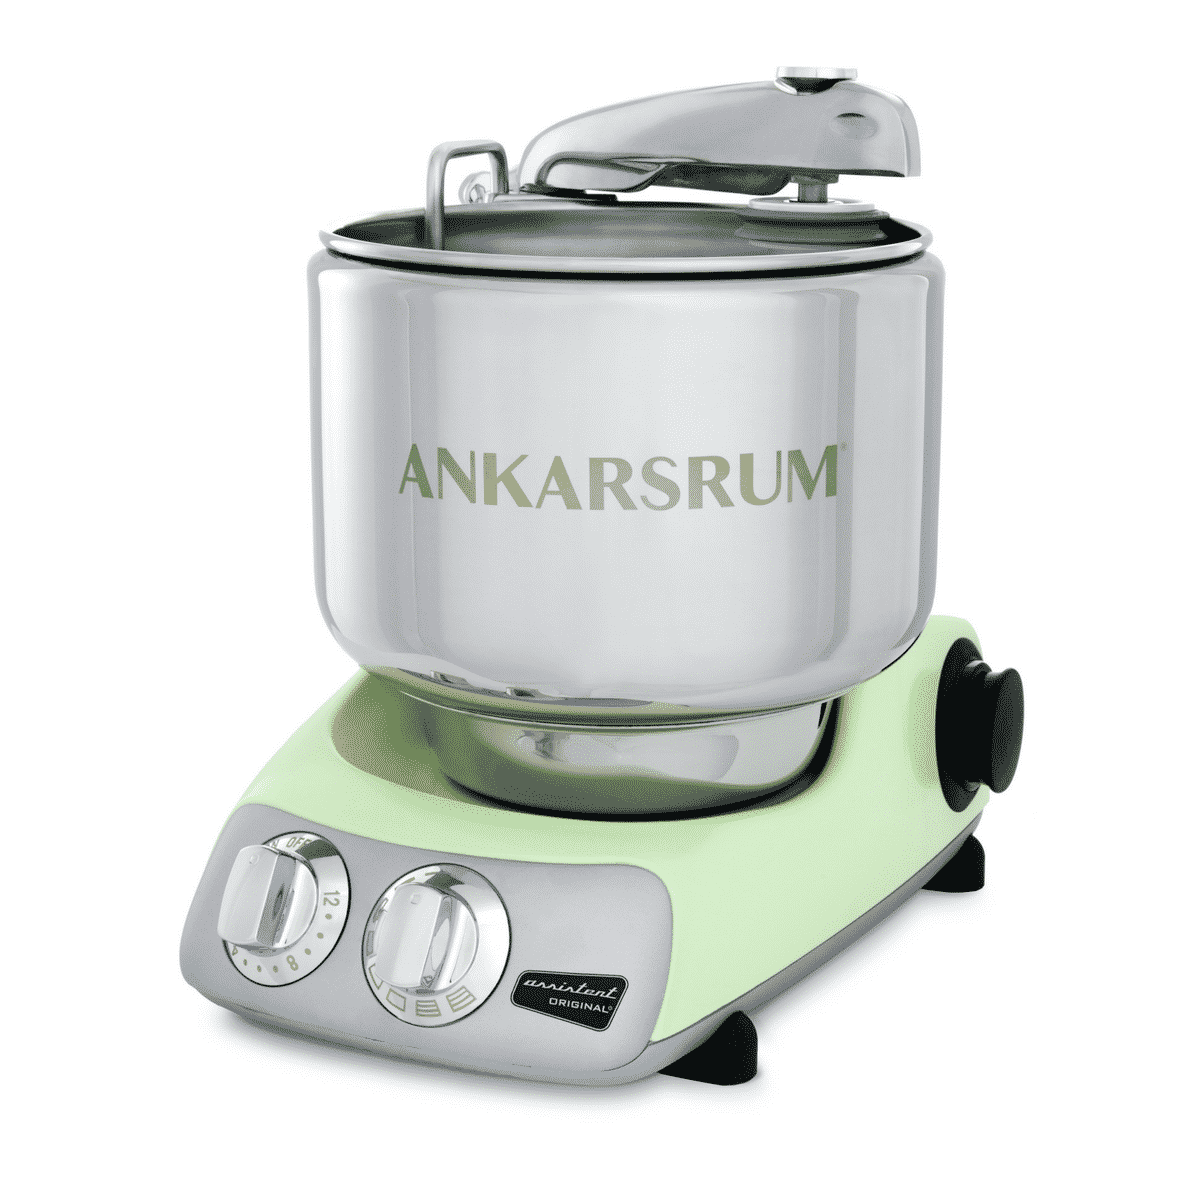 Ankarsrum Assistent Original AKM 6230 - Lysegroen